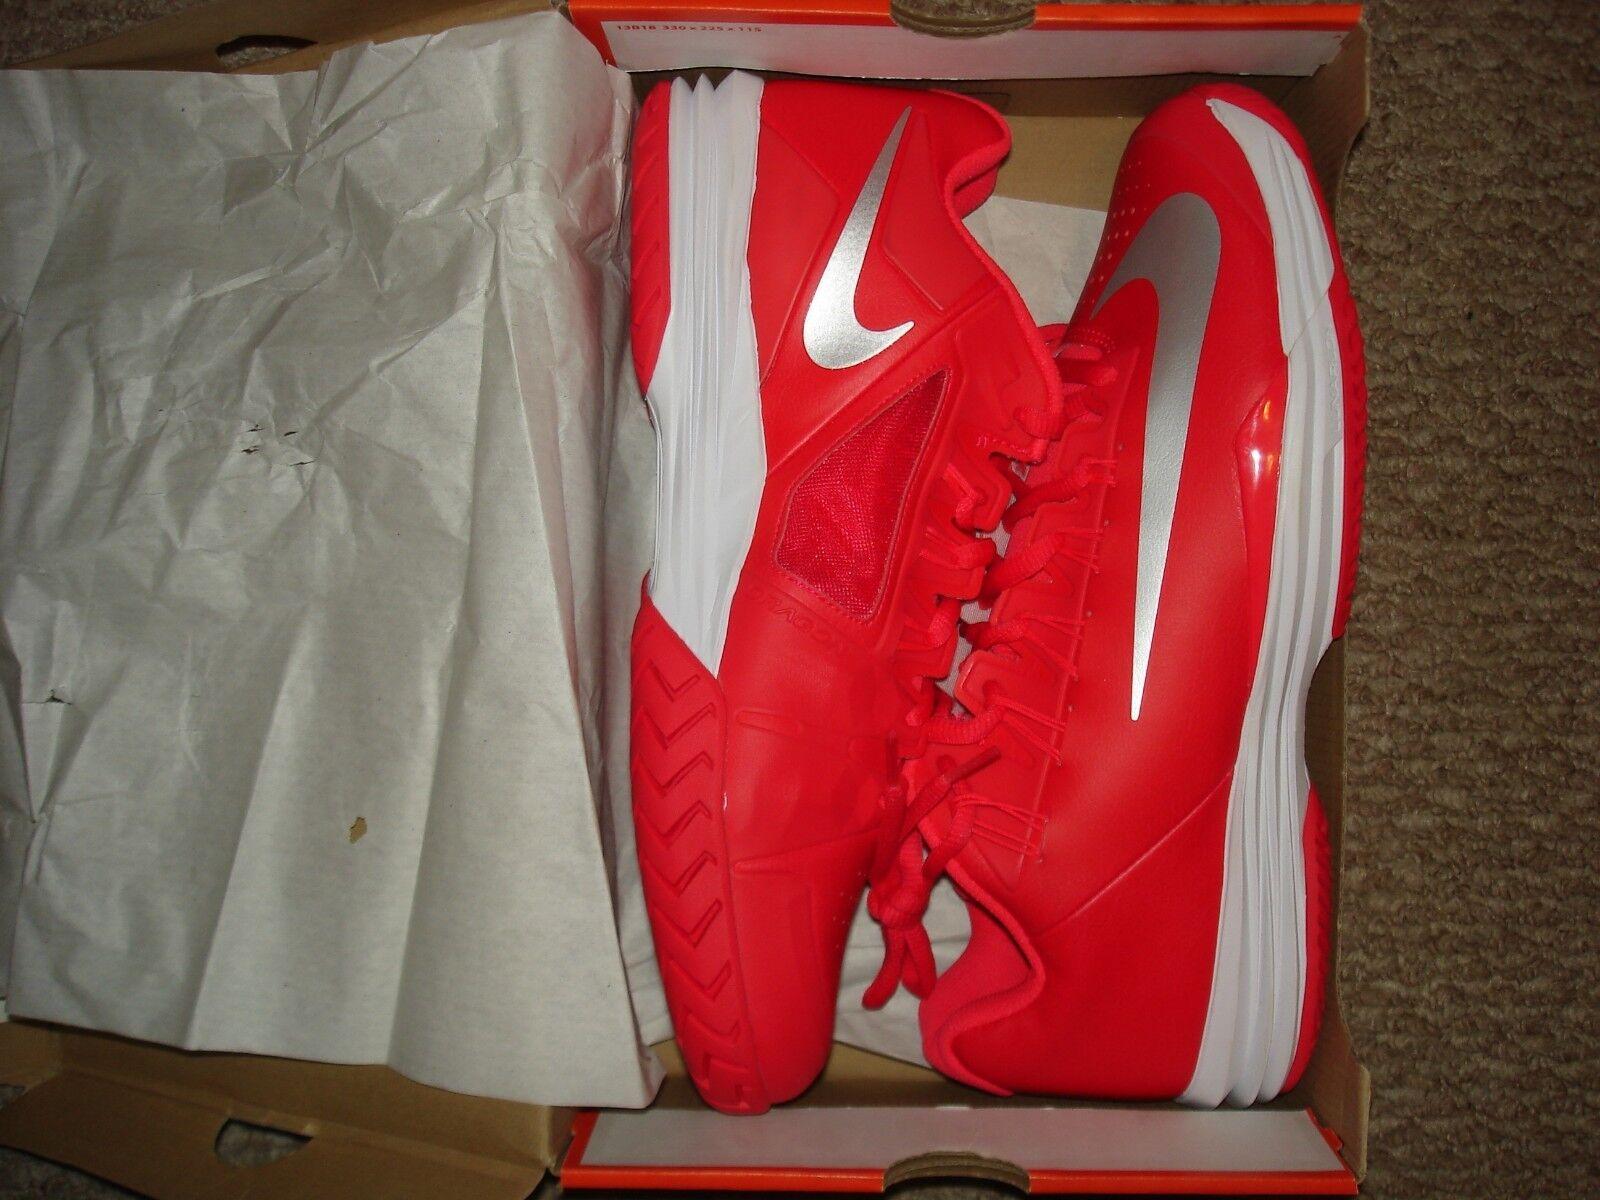 NIB Nike Nadal Lunar Ballistec 1.5 Team Red Tennis shoes 705285-602 Sz 12.5